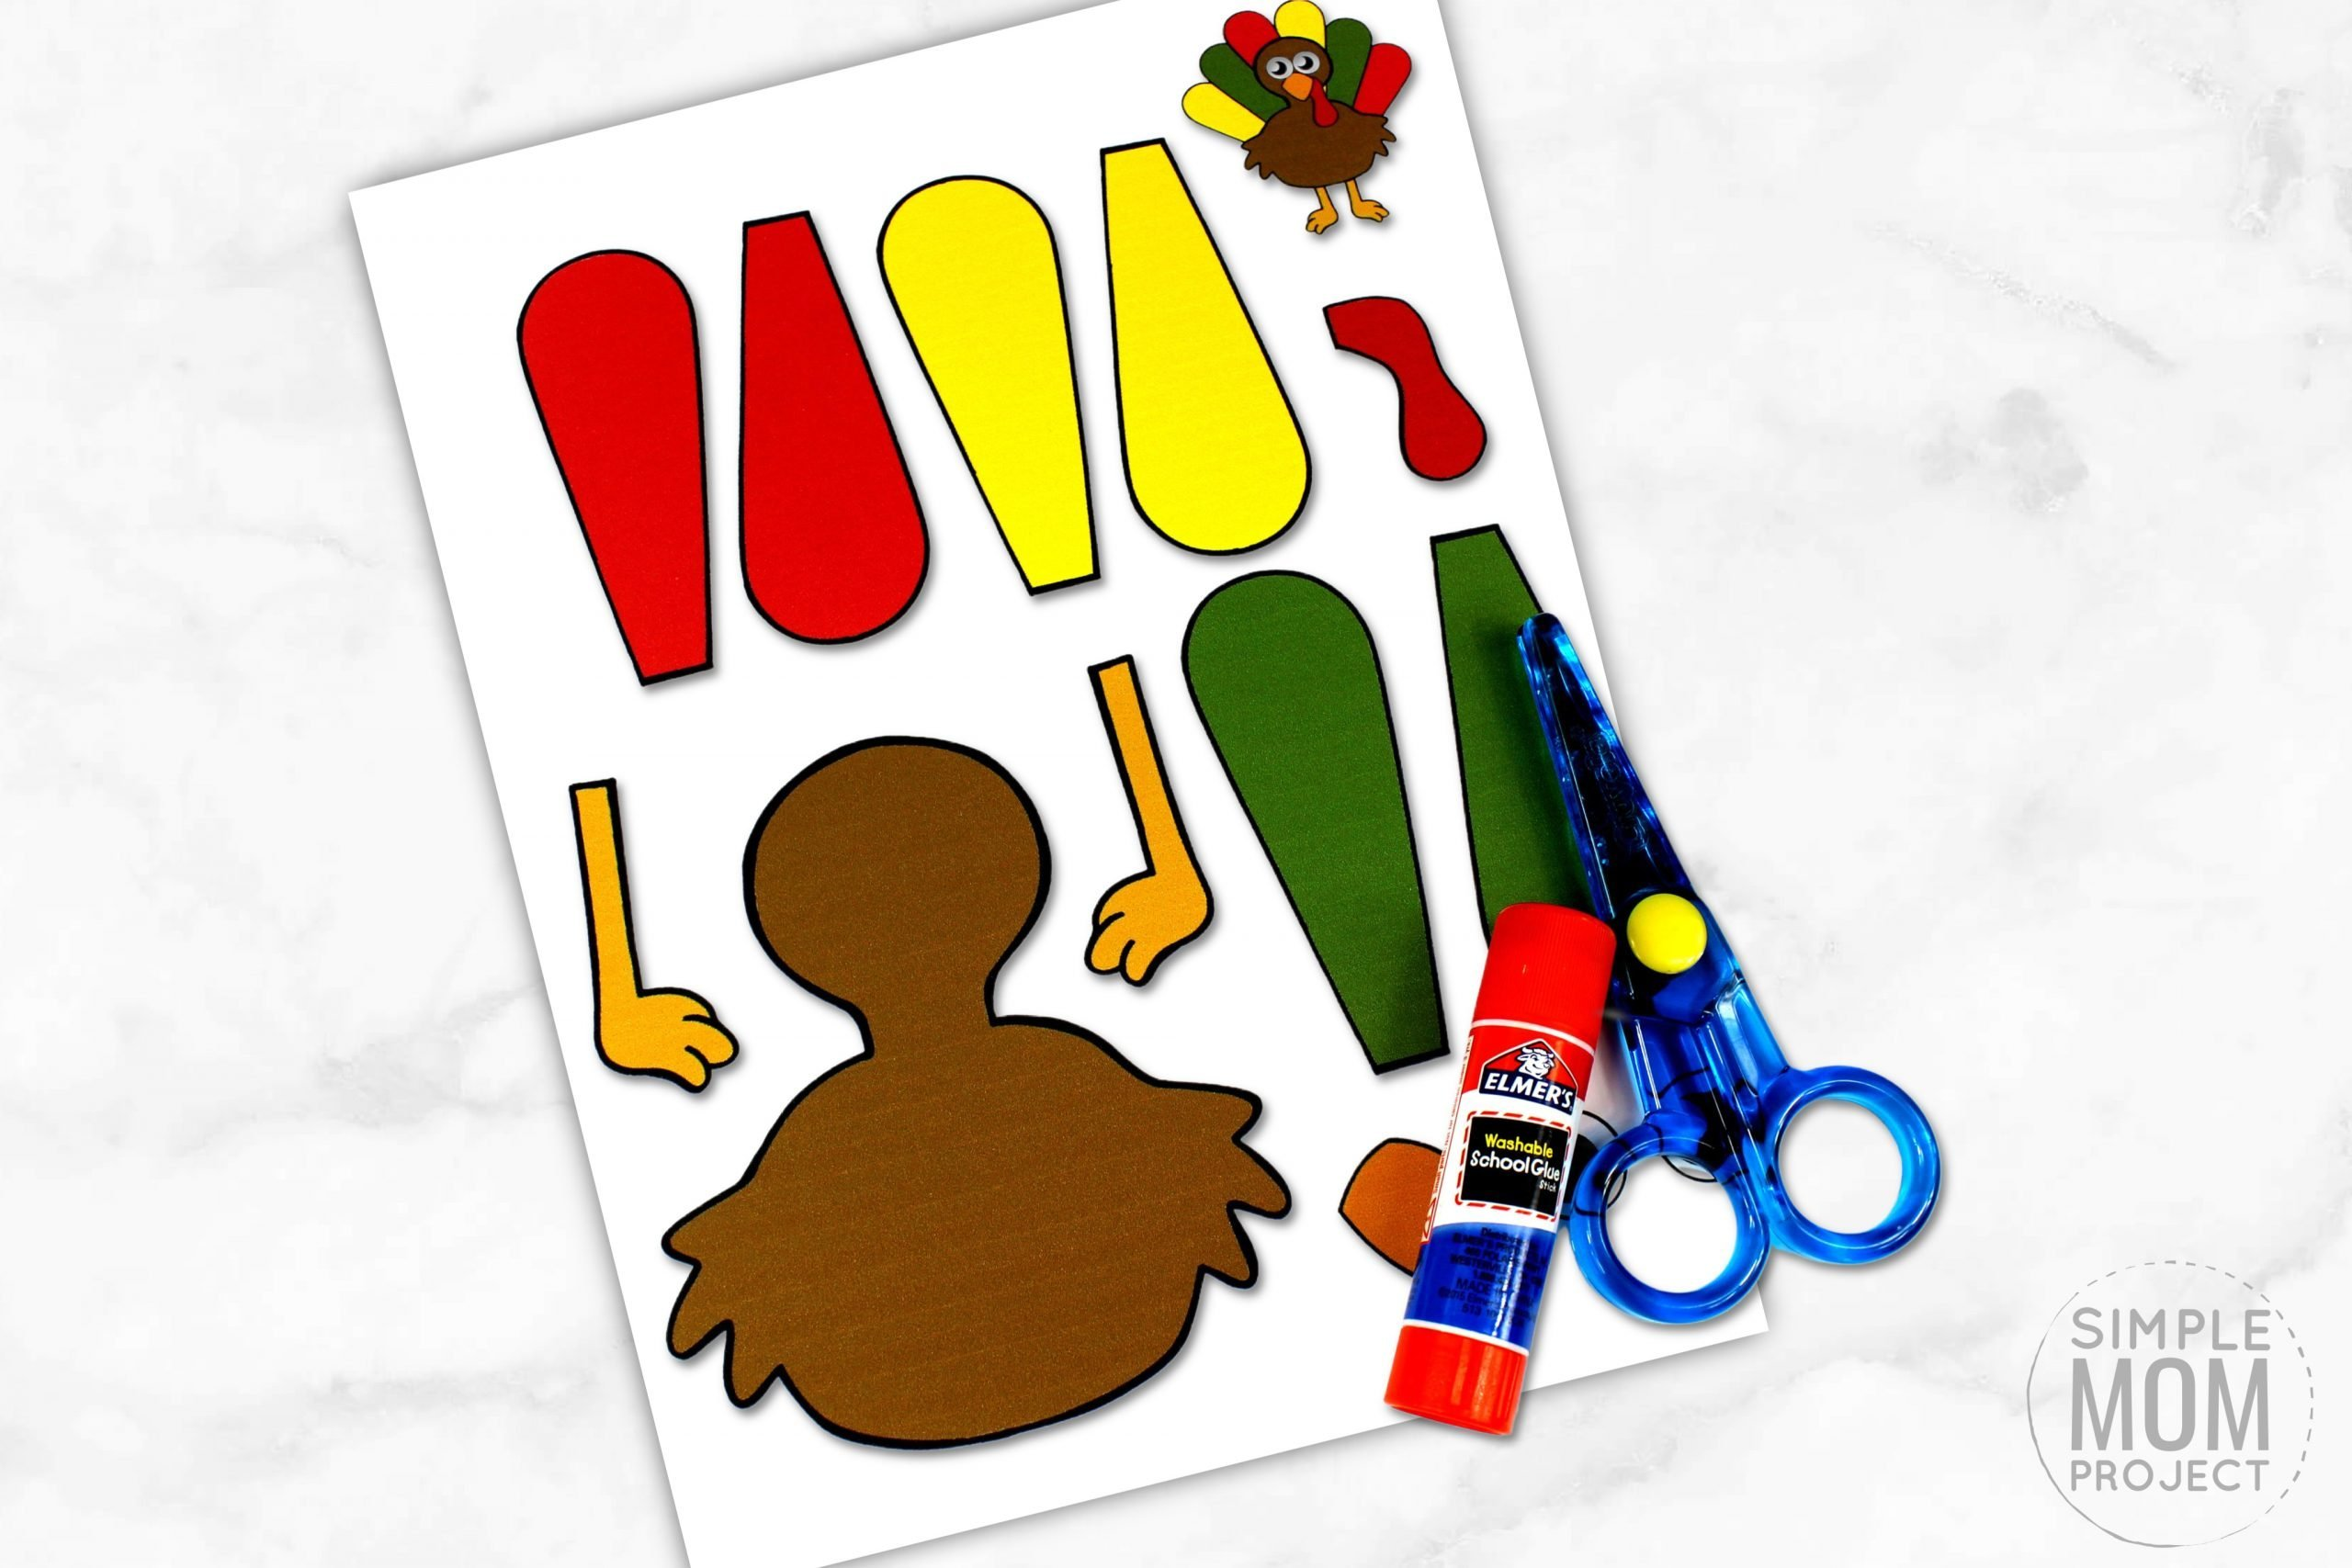 Free Printable Turkey Craft for Kids, preschoolers toddlers and kindergartners